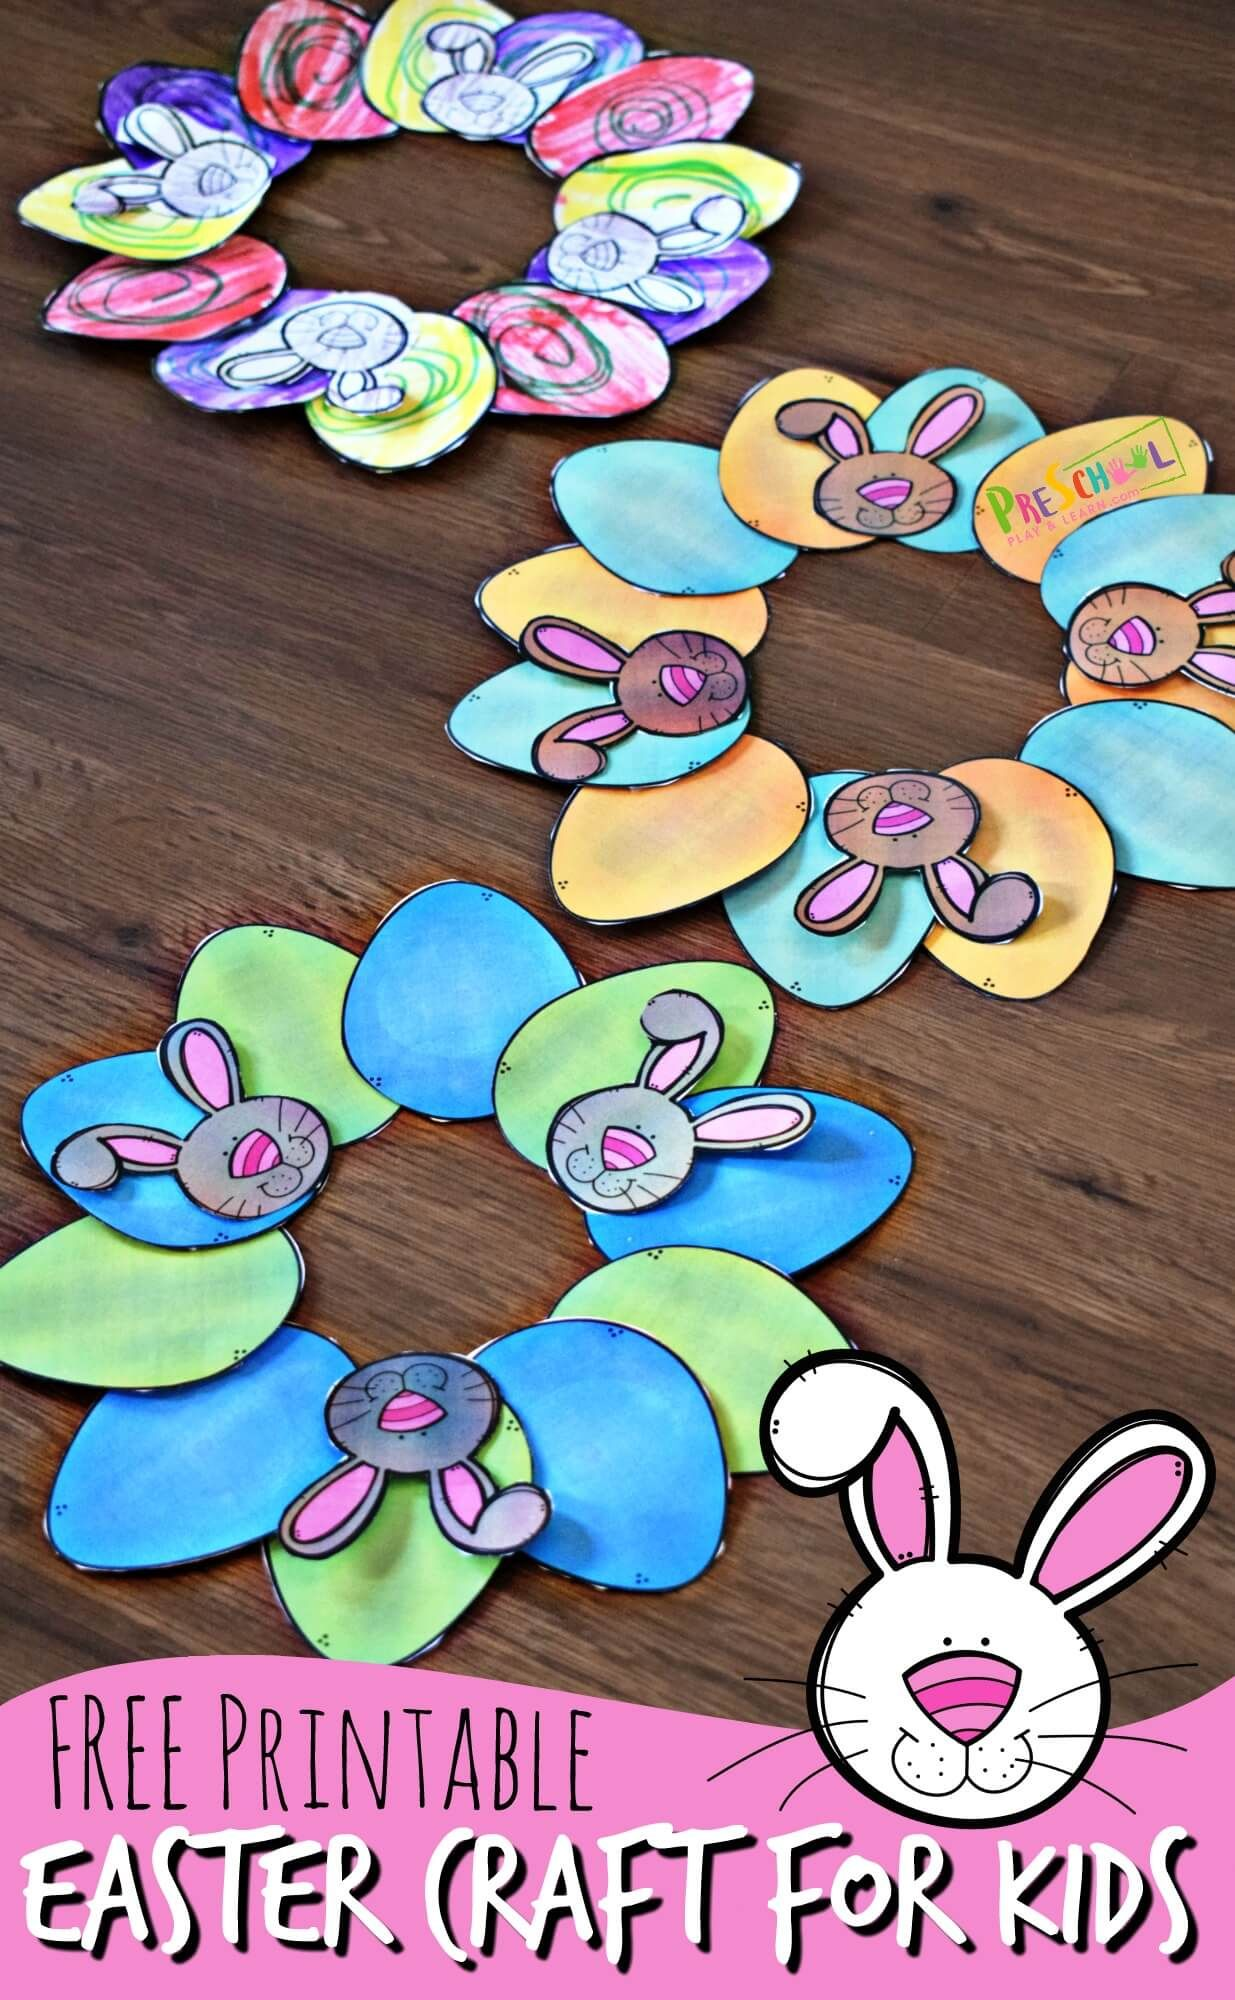 FREE Printable Easter Craft for Kids | Easter crafts ...